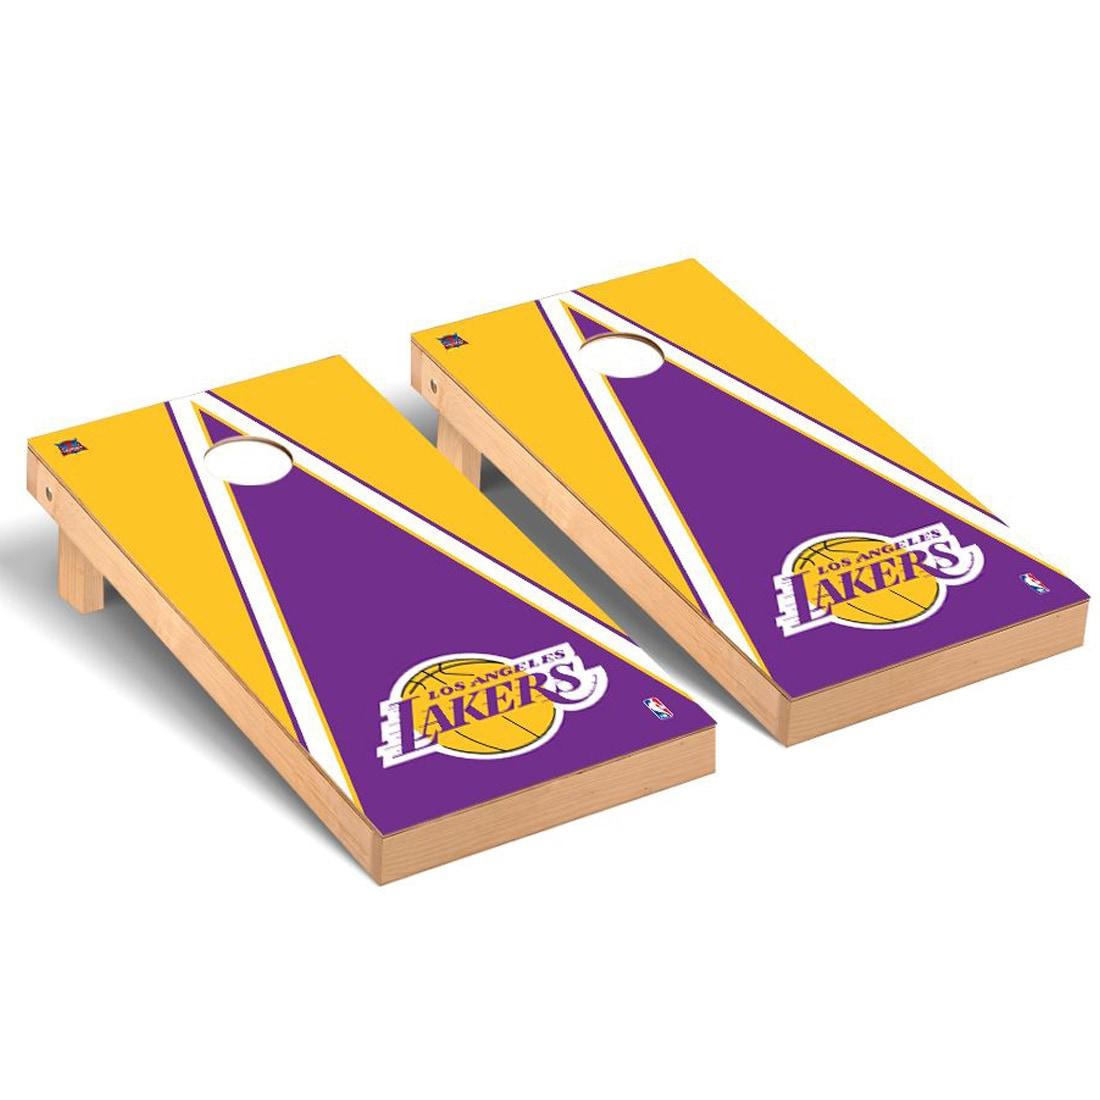 Los Angeles Lakers 2' x 4' Triangle Museum Cornhole Board Tailgate Toss Set